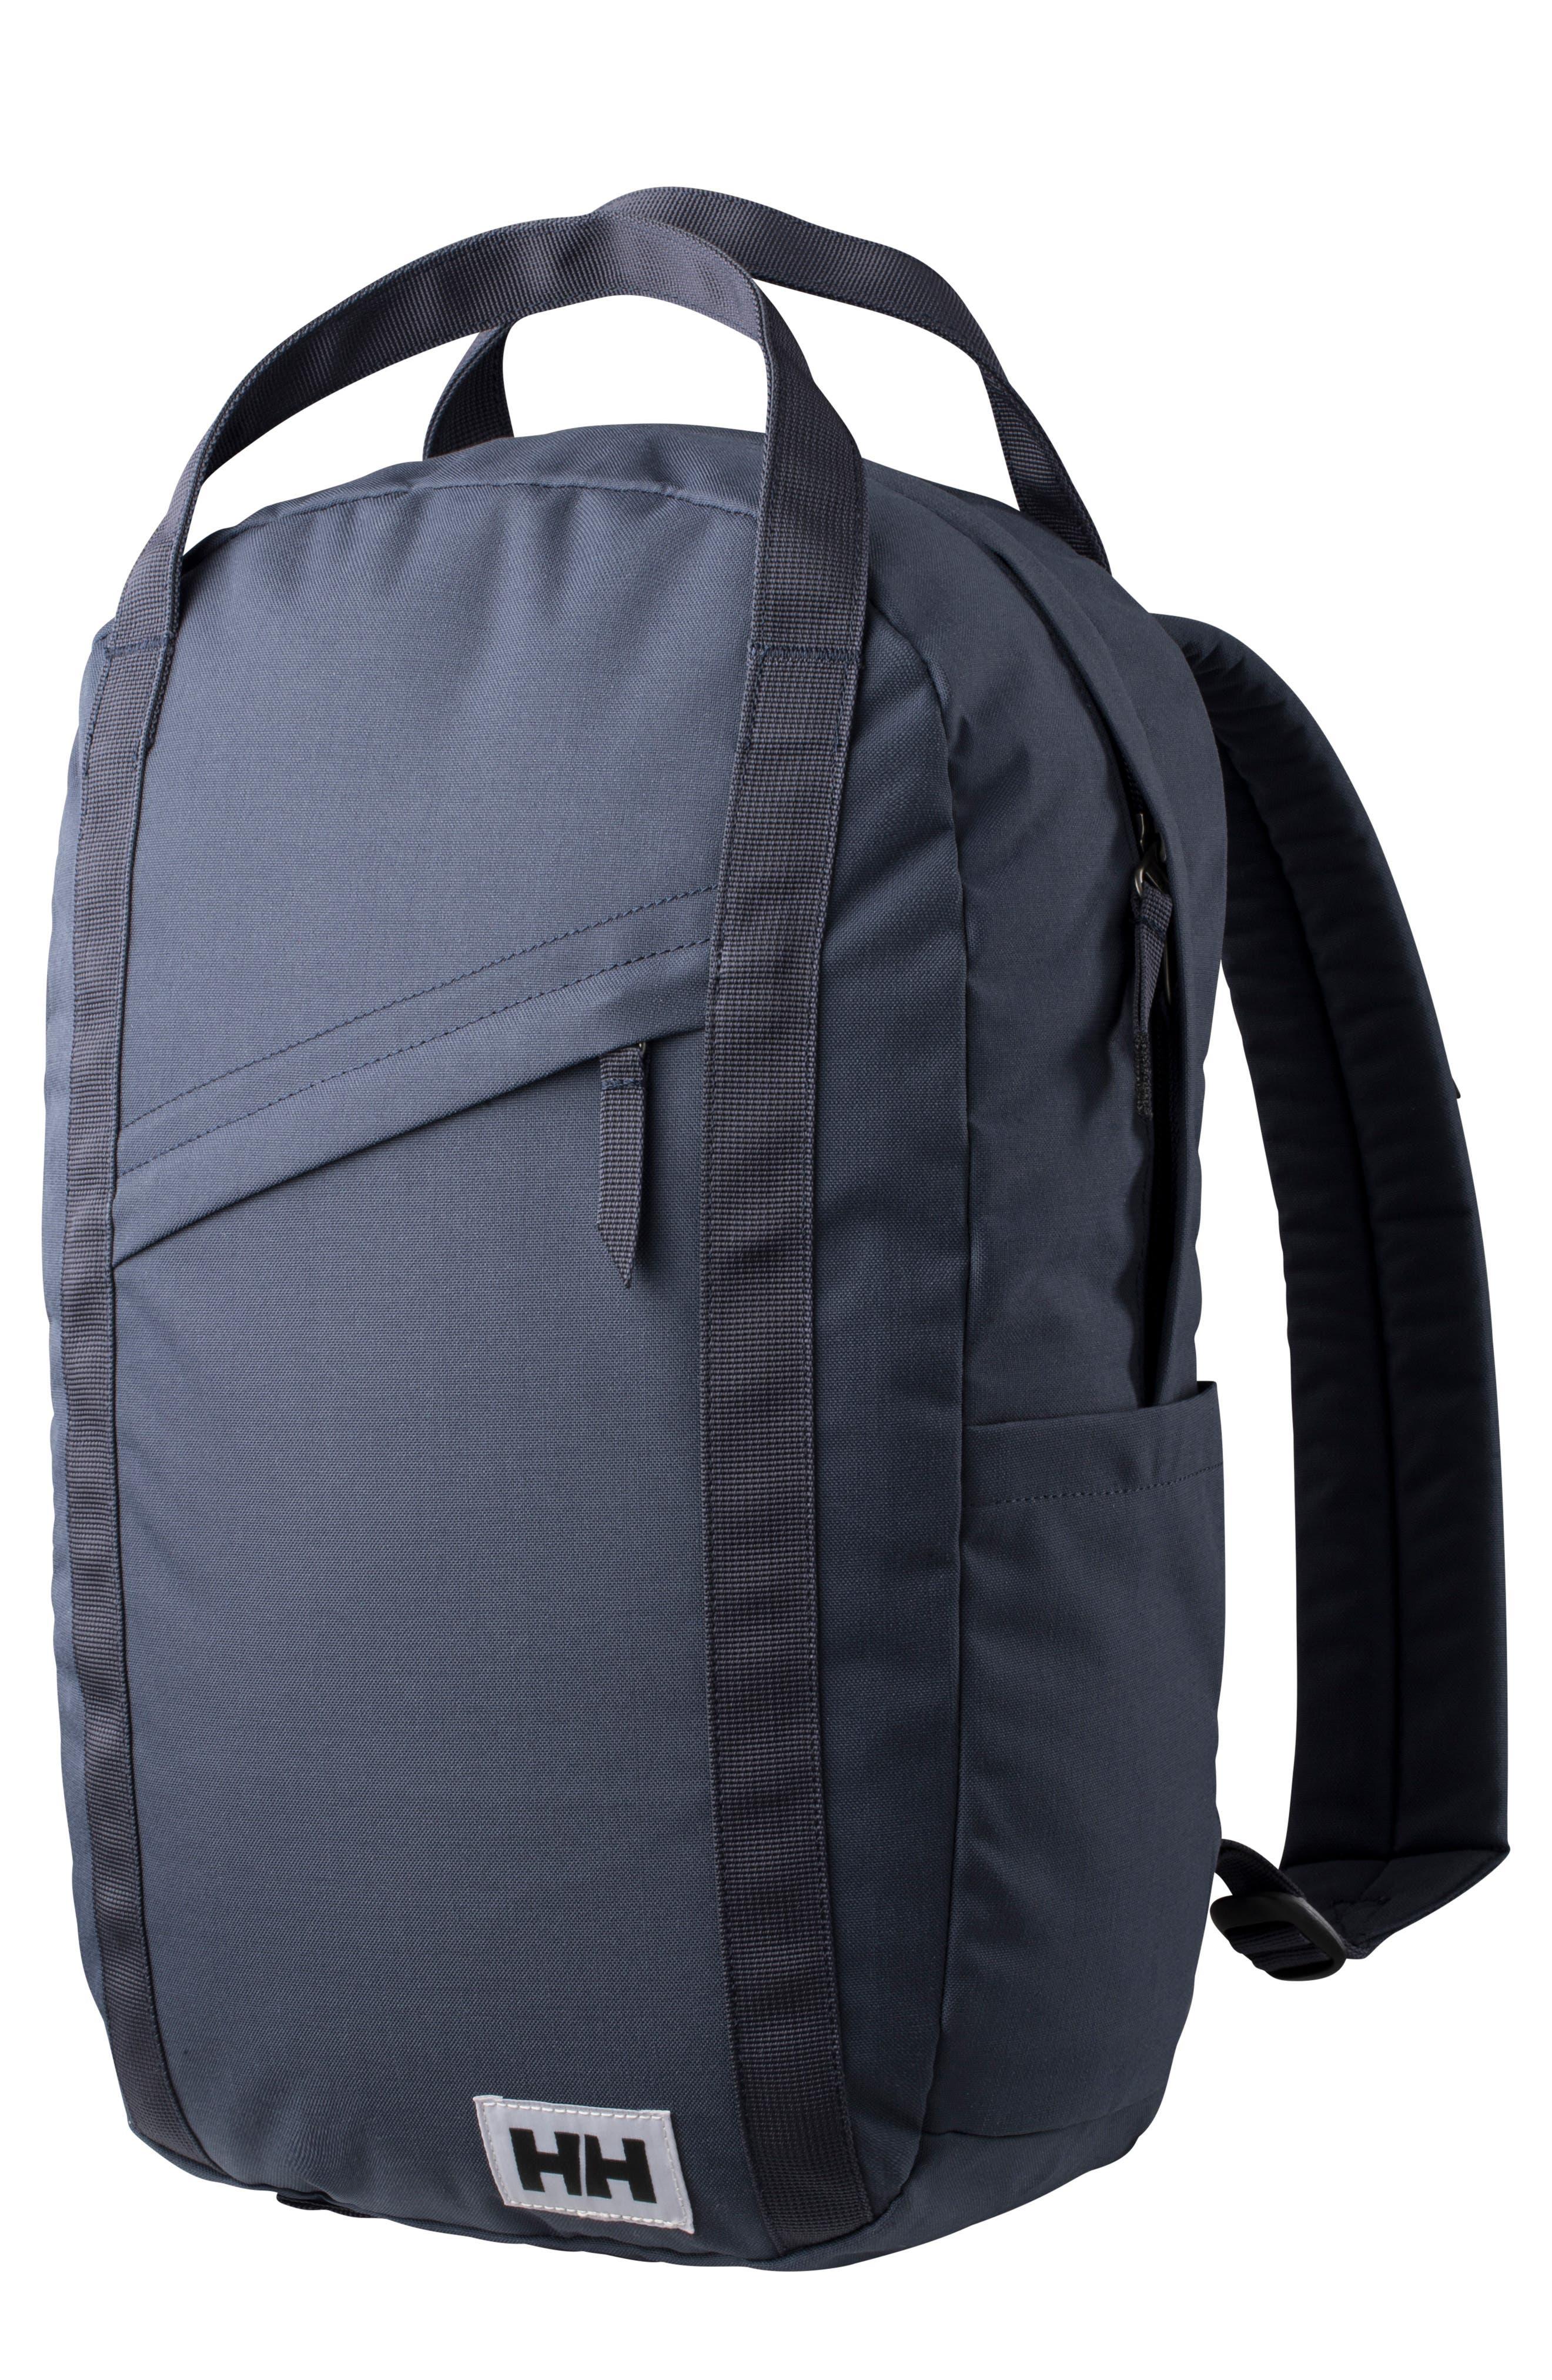 Helly Hansen Oslo Backpack - Grey